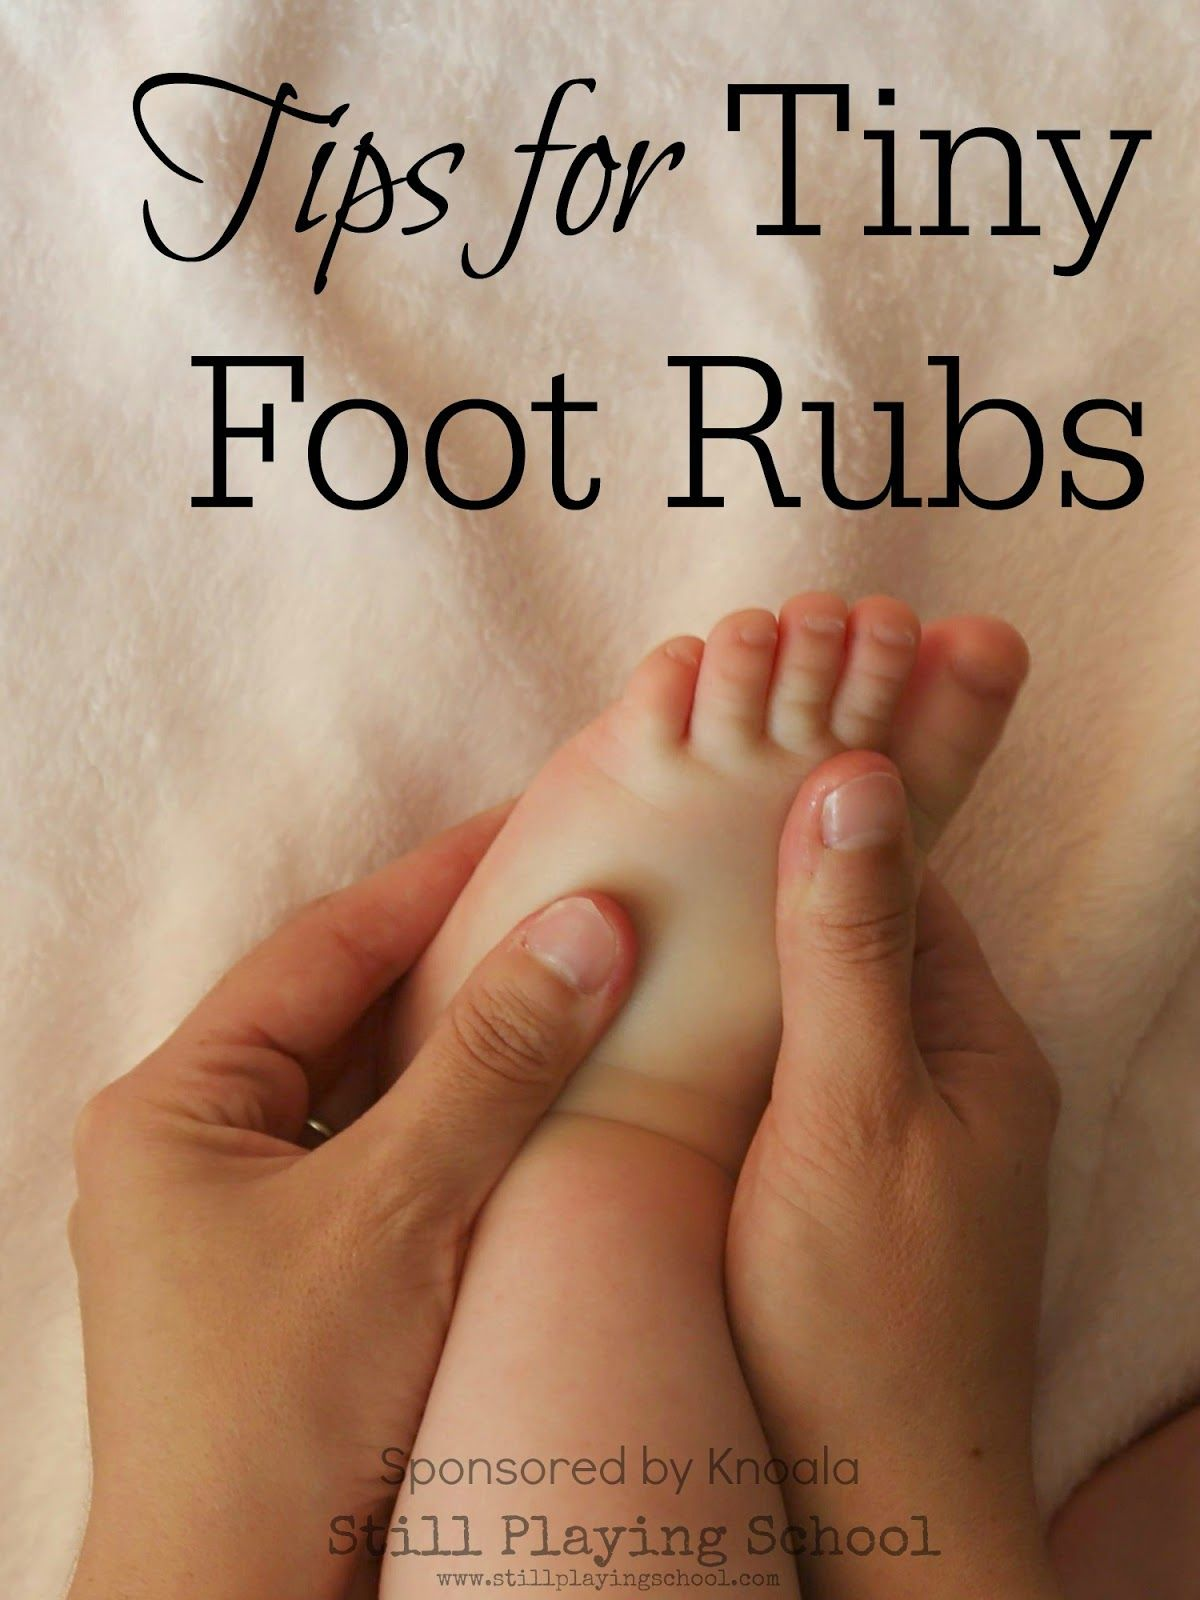 Footrubs